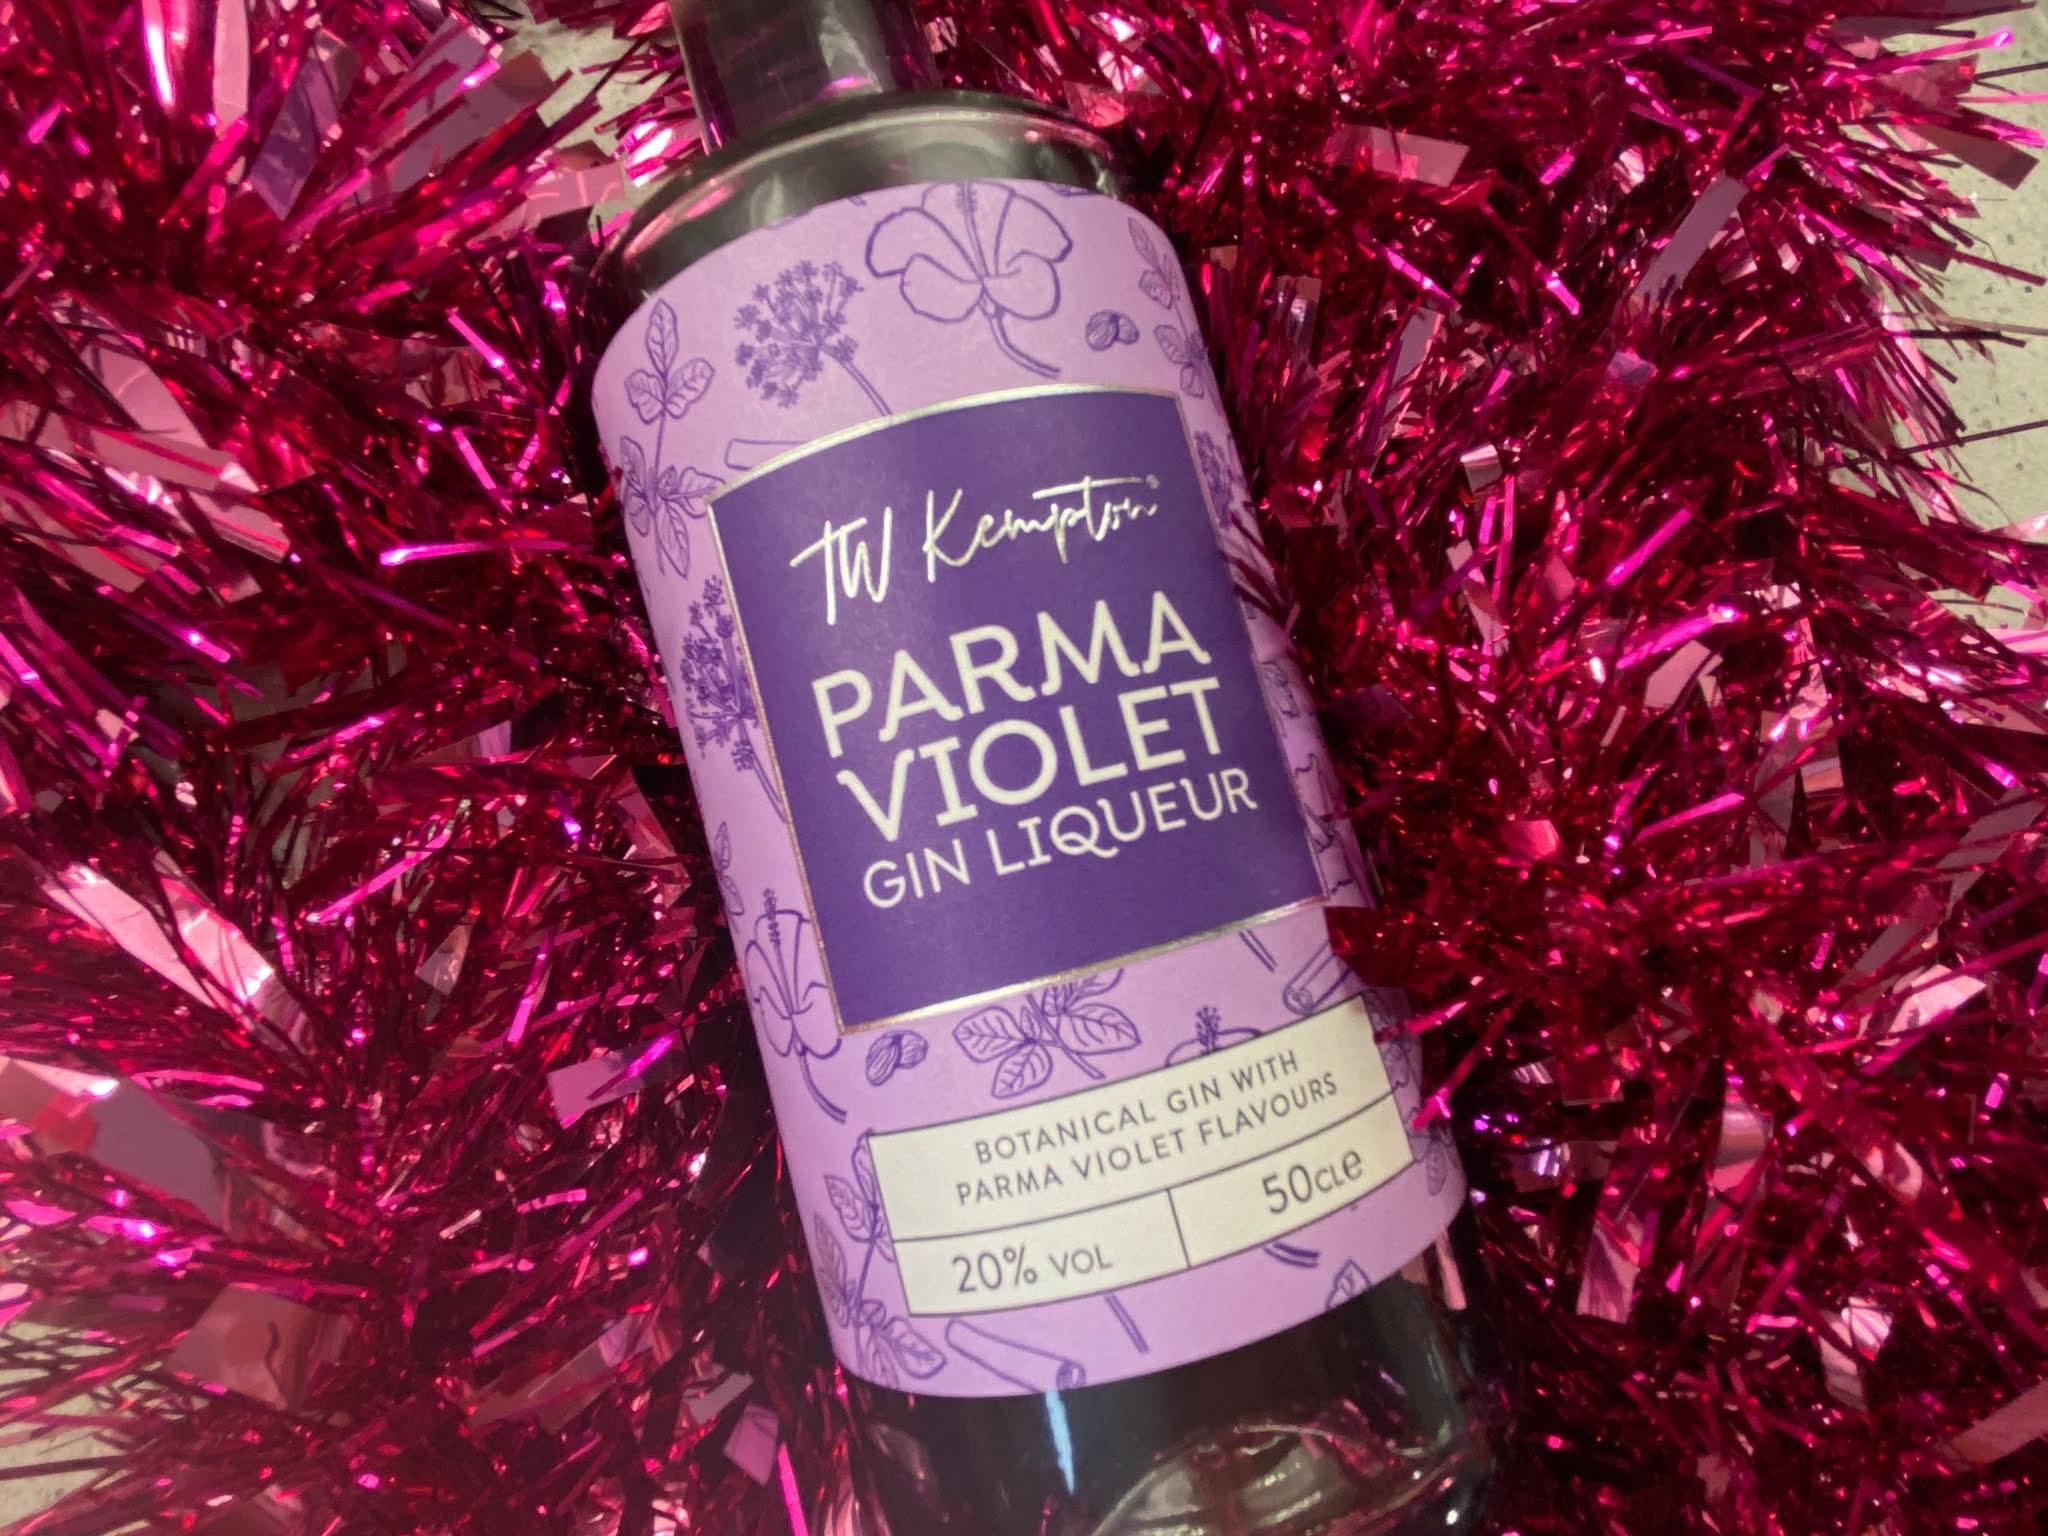 Parma Violet Gin liqueur